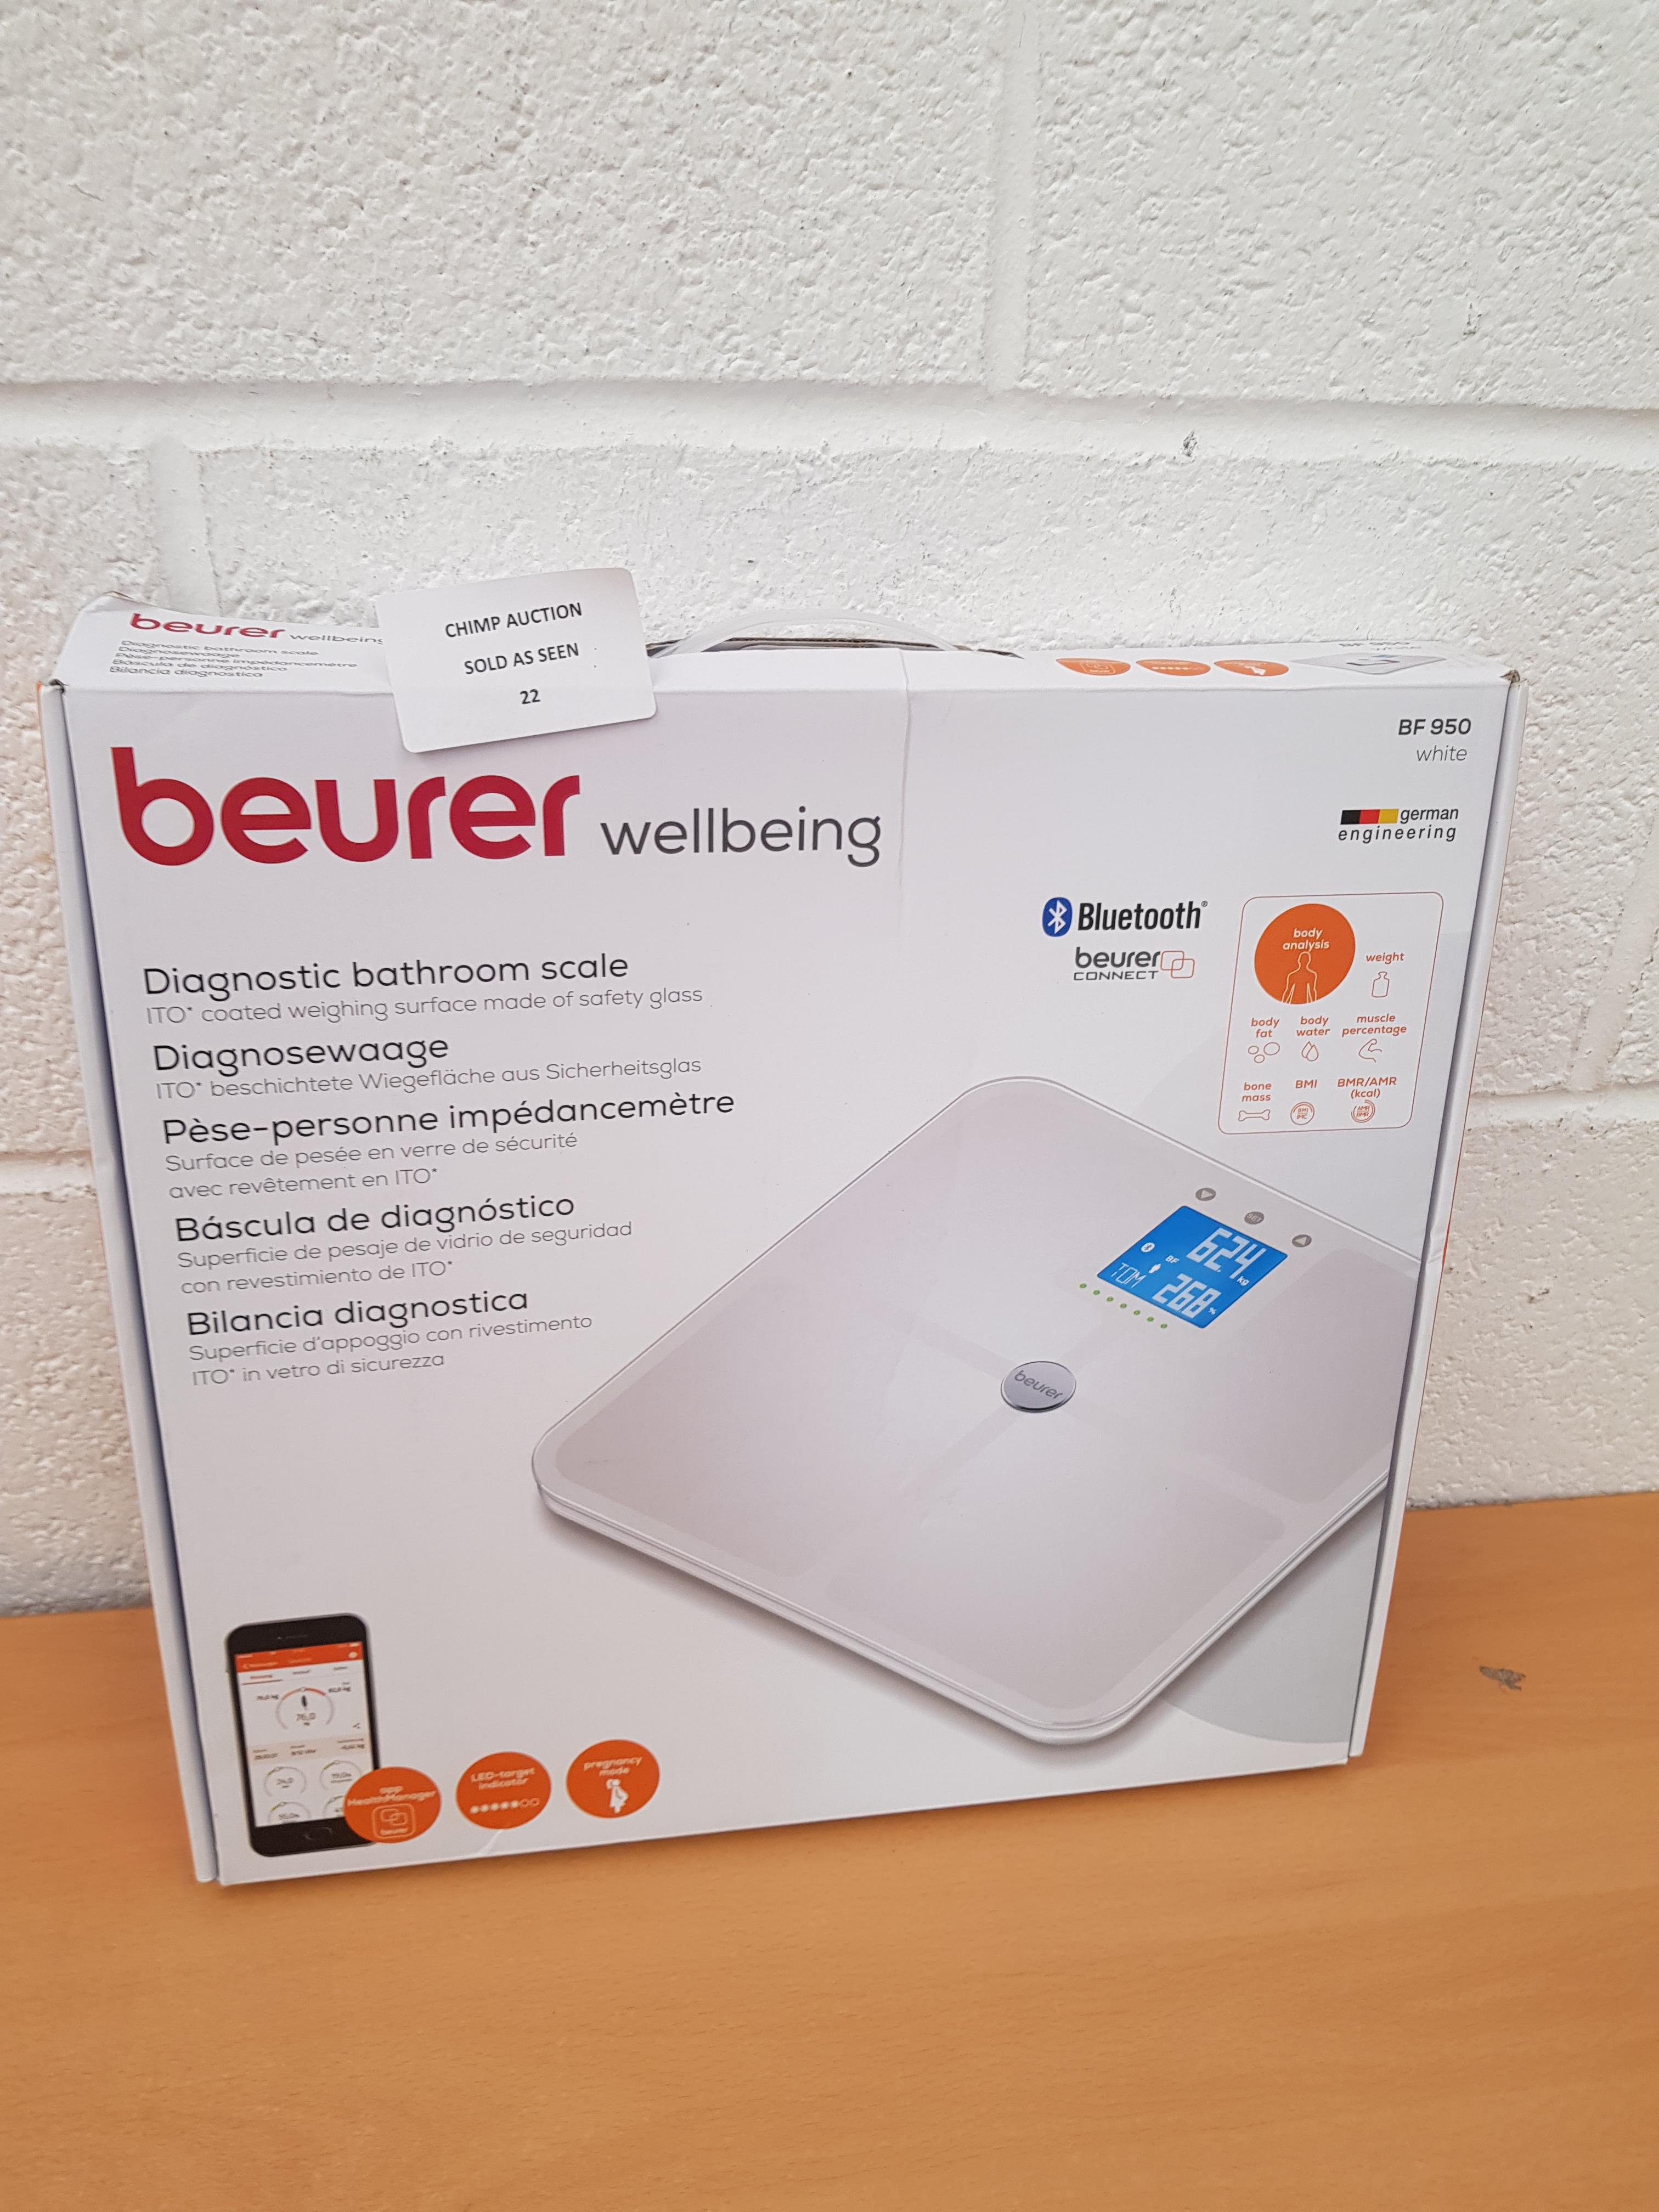 Lot 22 - Beurer BF950 Premium Diagnostic Bathroom Scale RRP £129.99